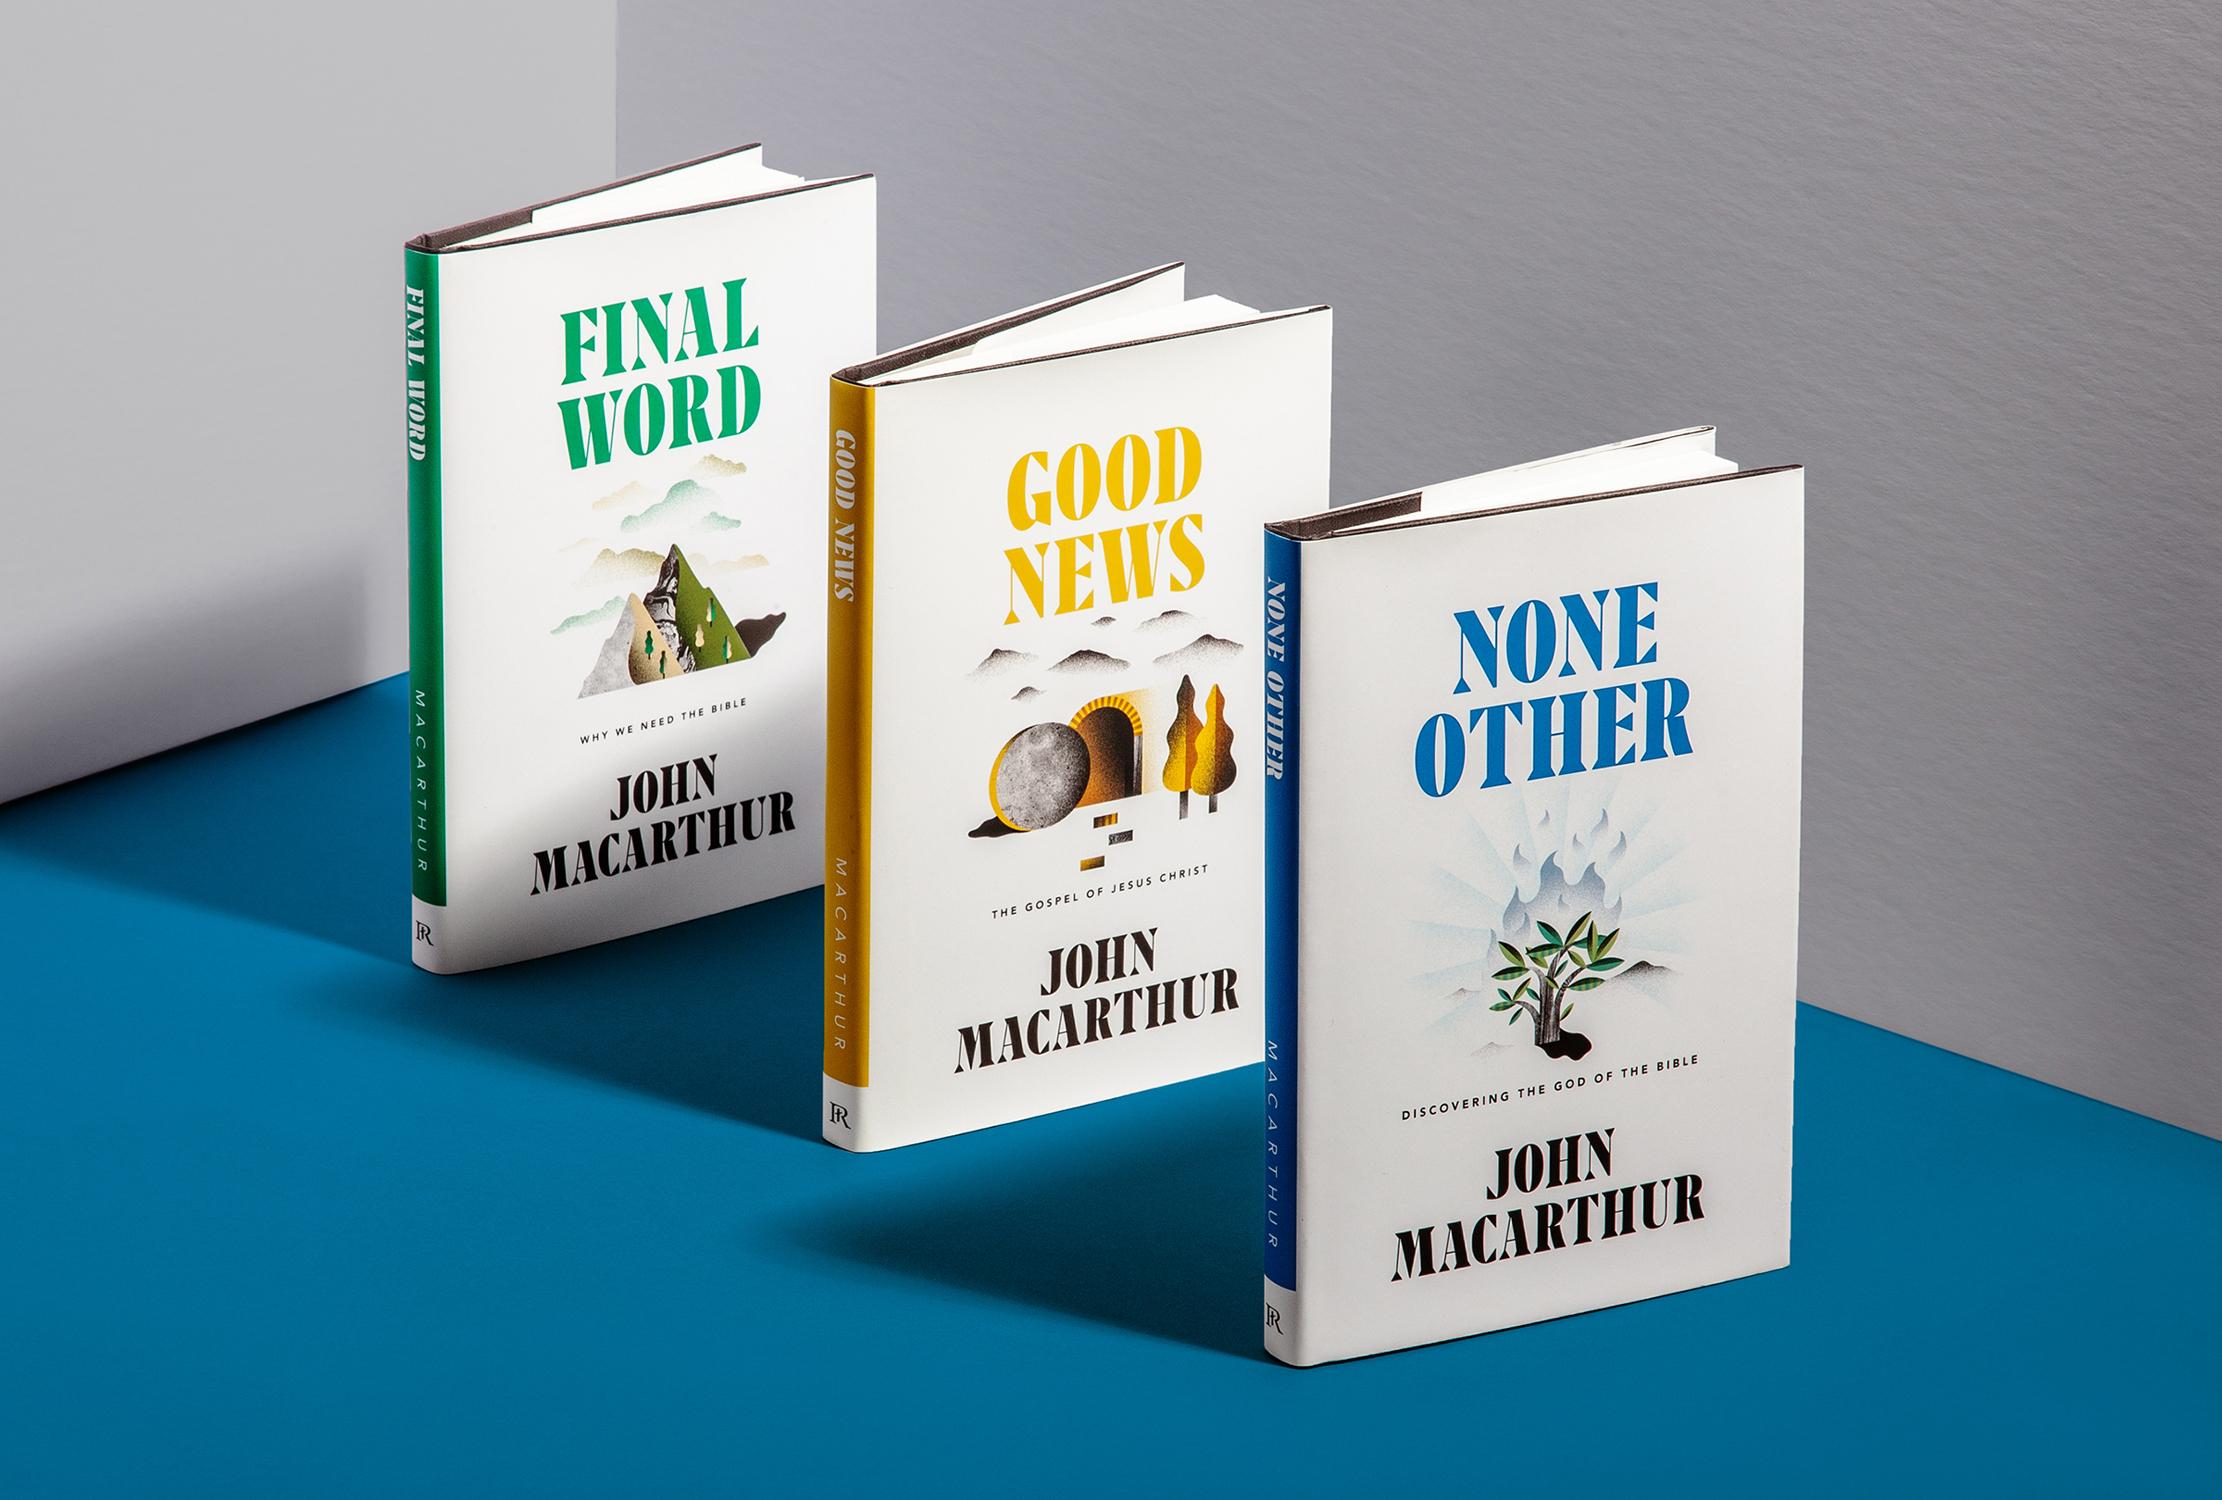 MacArthur Book Series